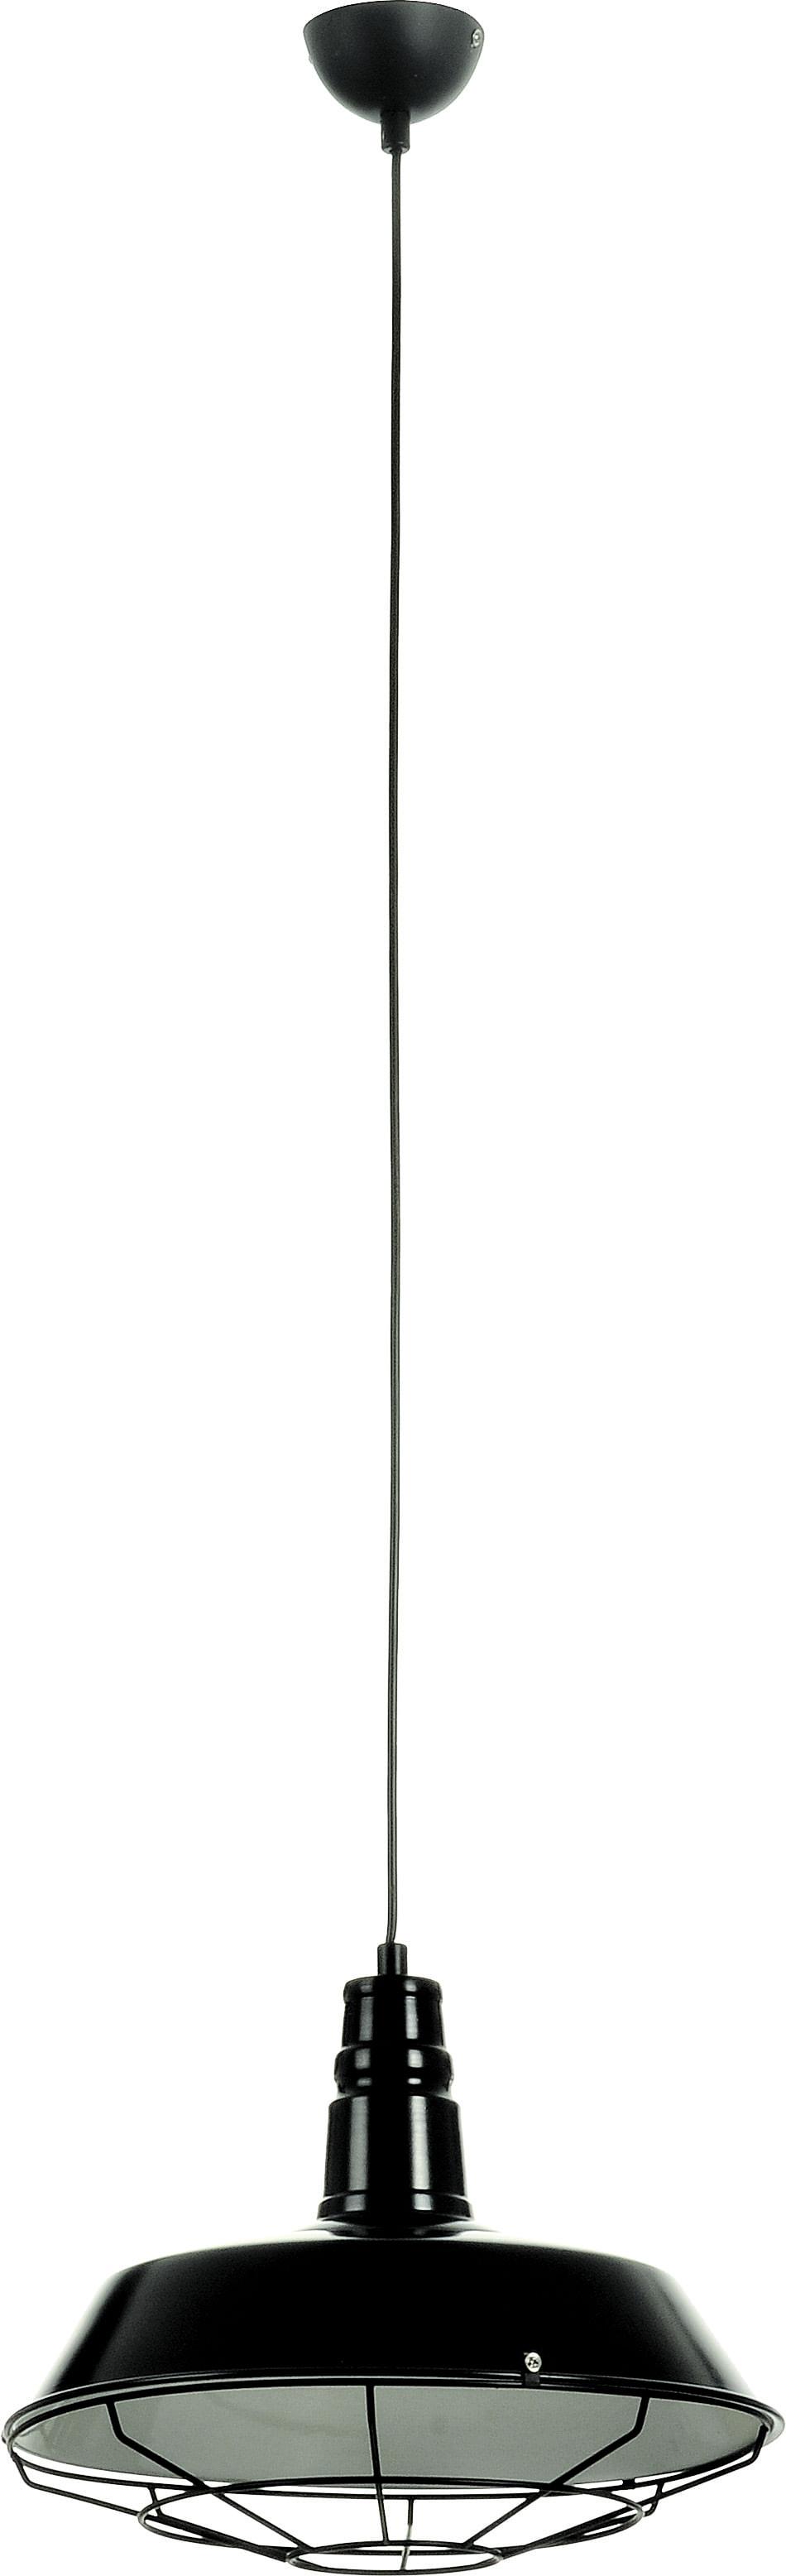 Industrial Pendant Lamp Loft Black 60W